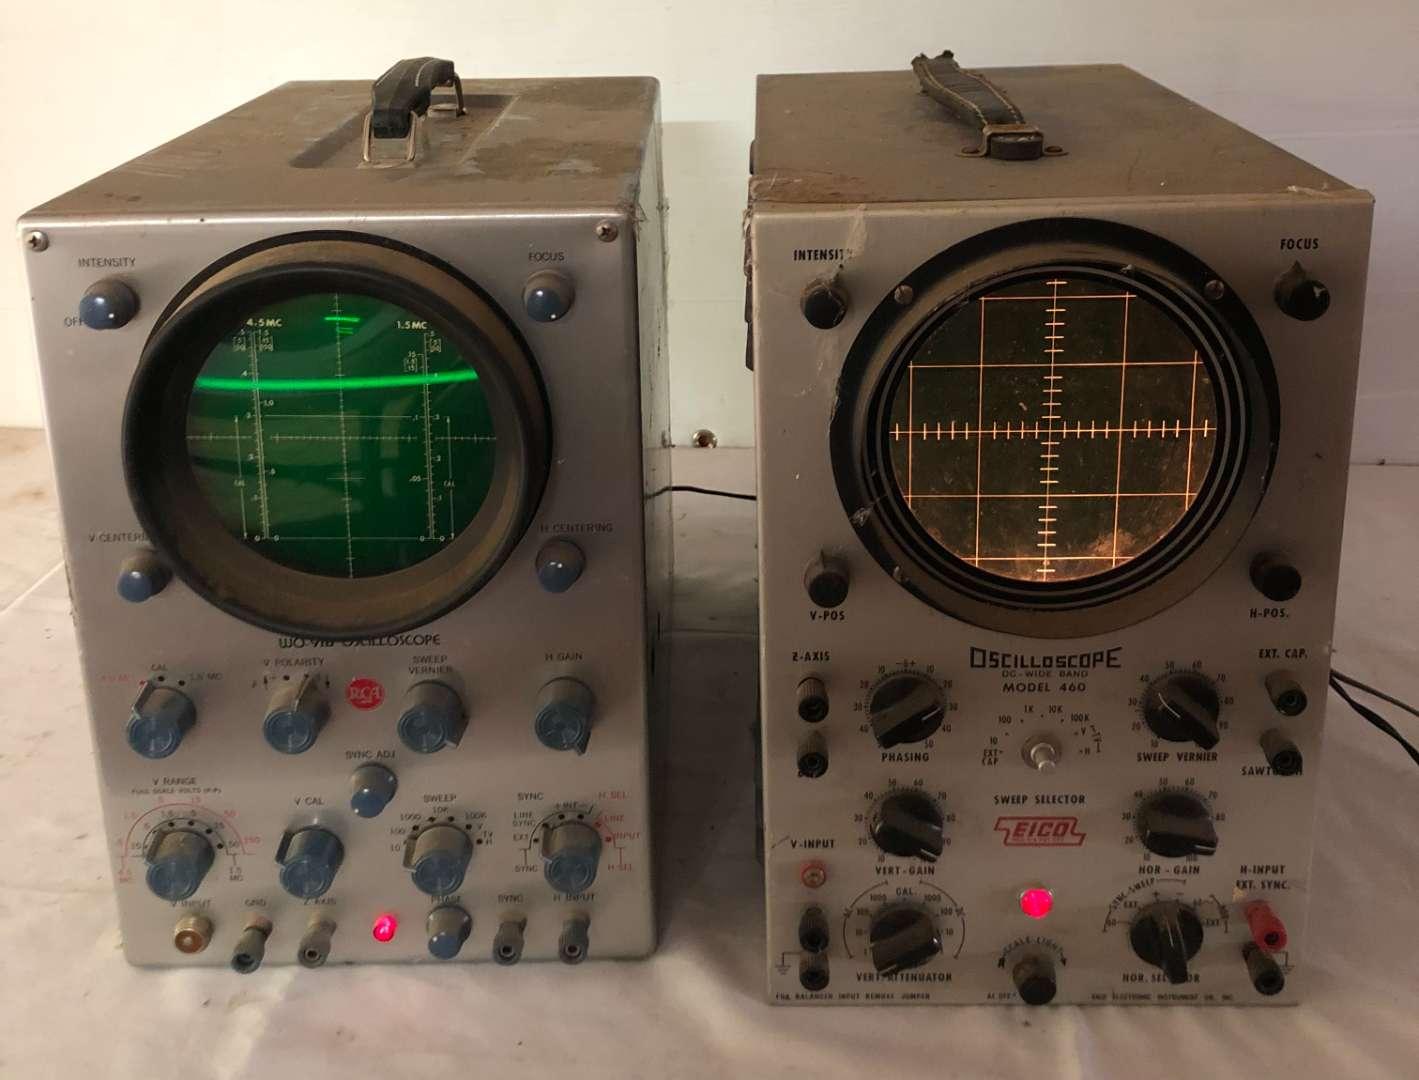 Lot # 245 - 2 Vintage Oscilloscopes, EICO and RCA (main image)